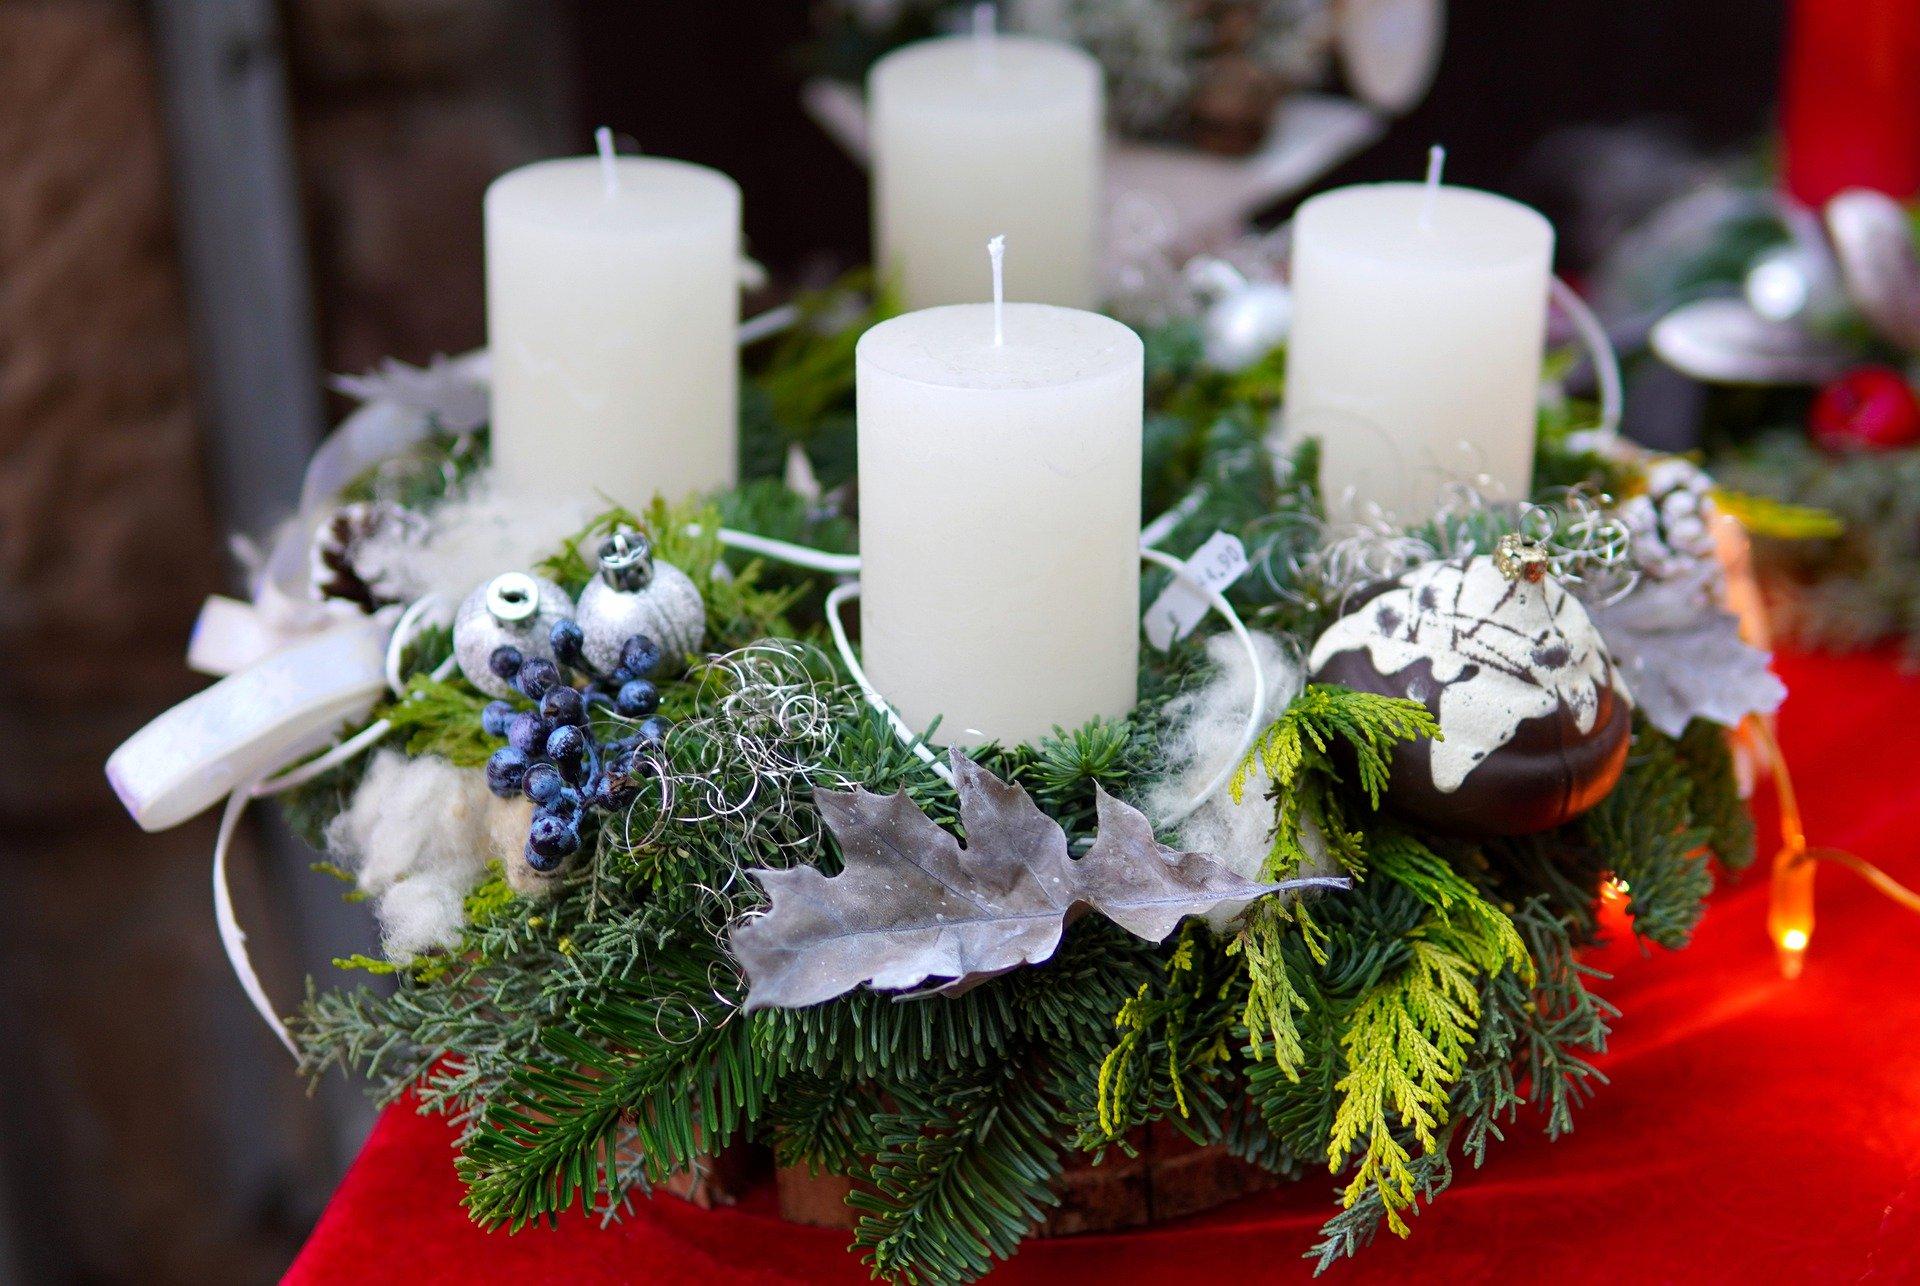 Christmas in Switzerland - Swiss Christmas traiditions